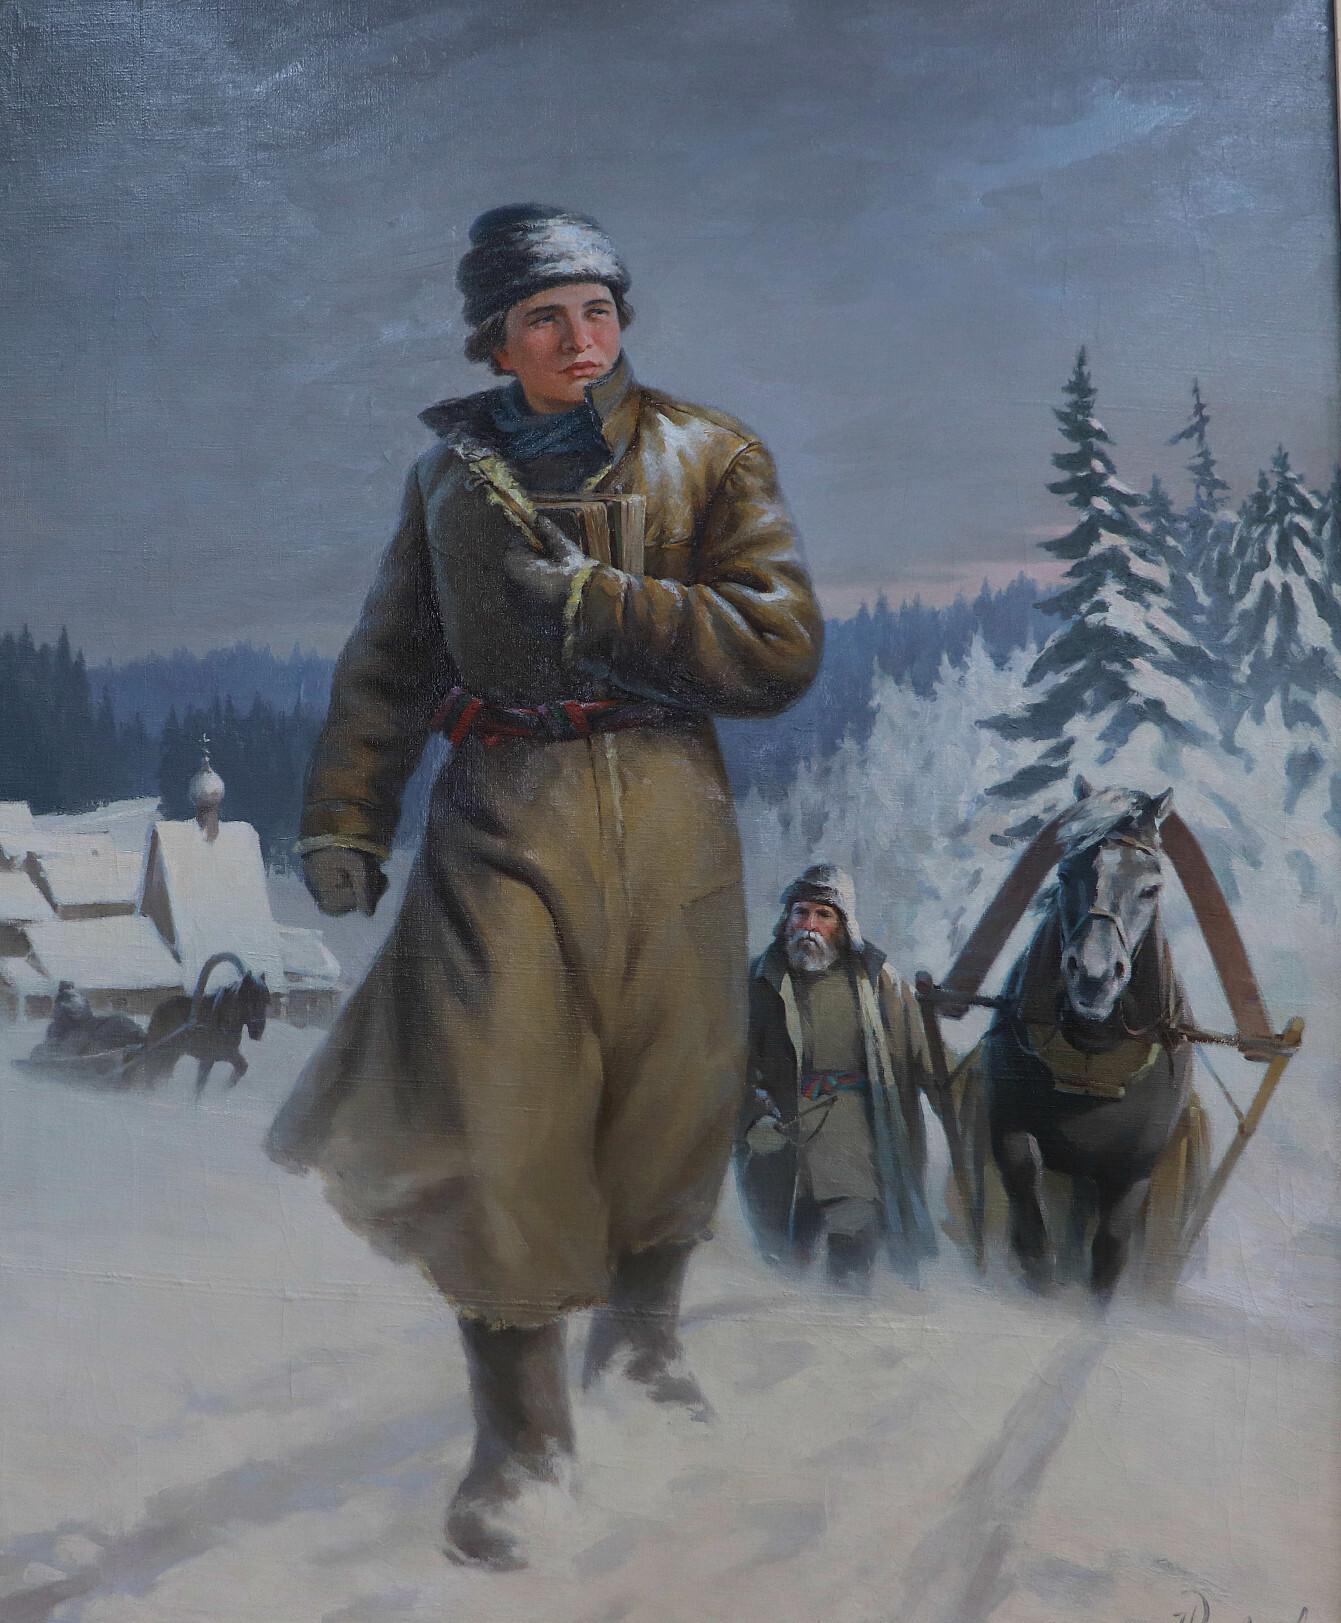 Н. И. Кисляков. «Ломоносов на пути в Москву», 1948